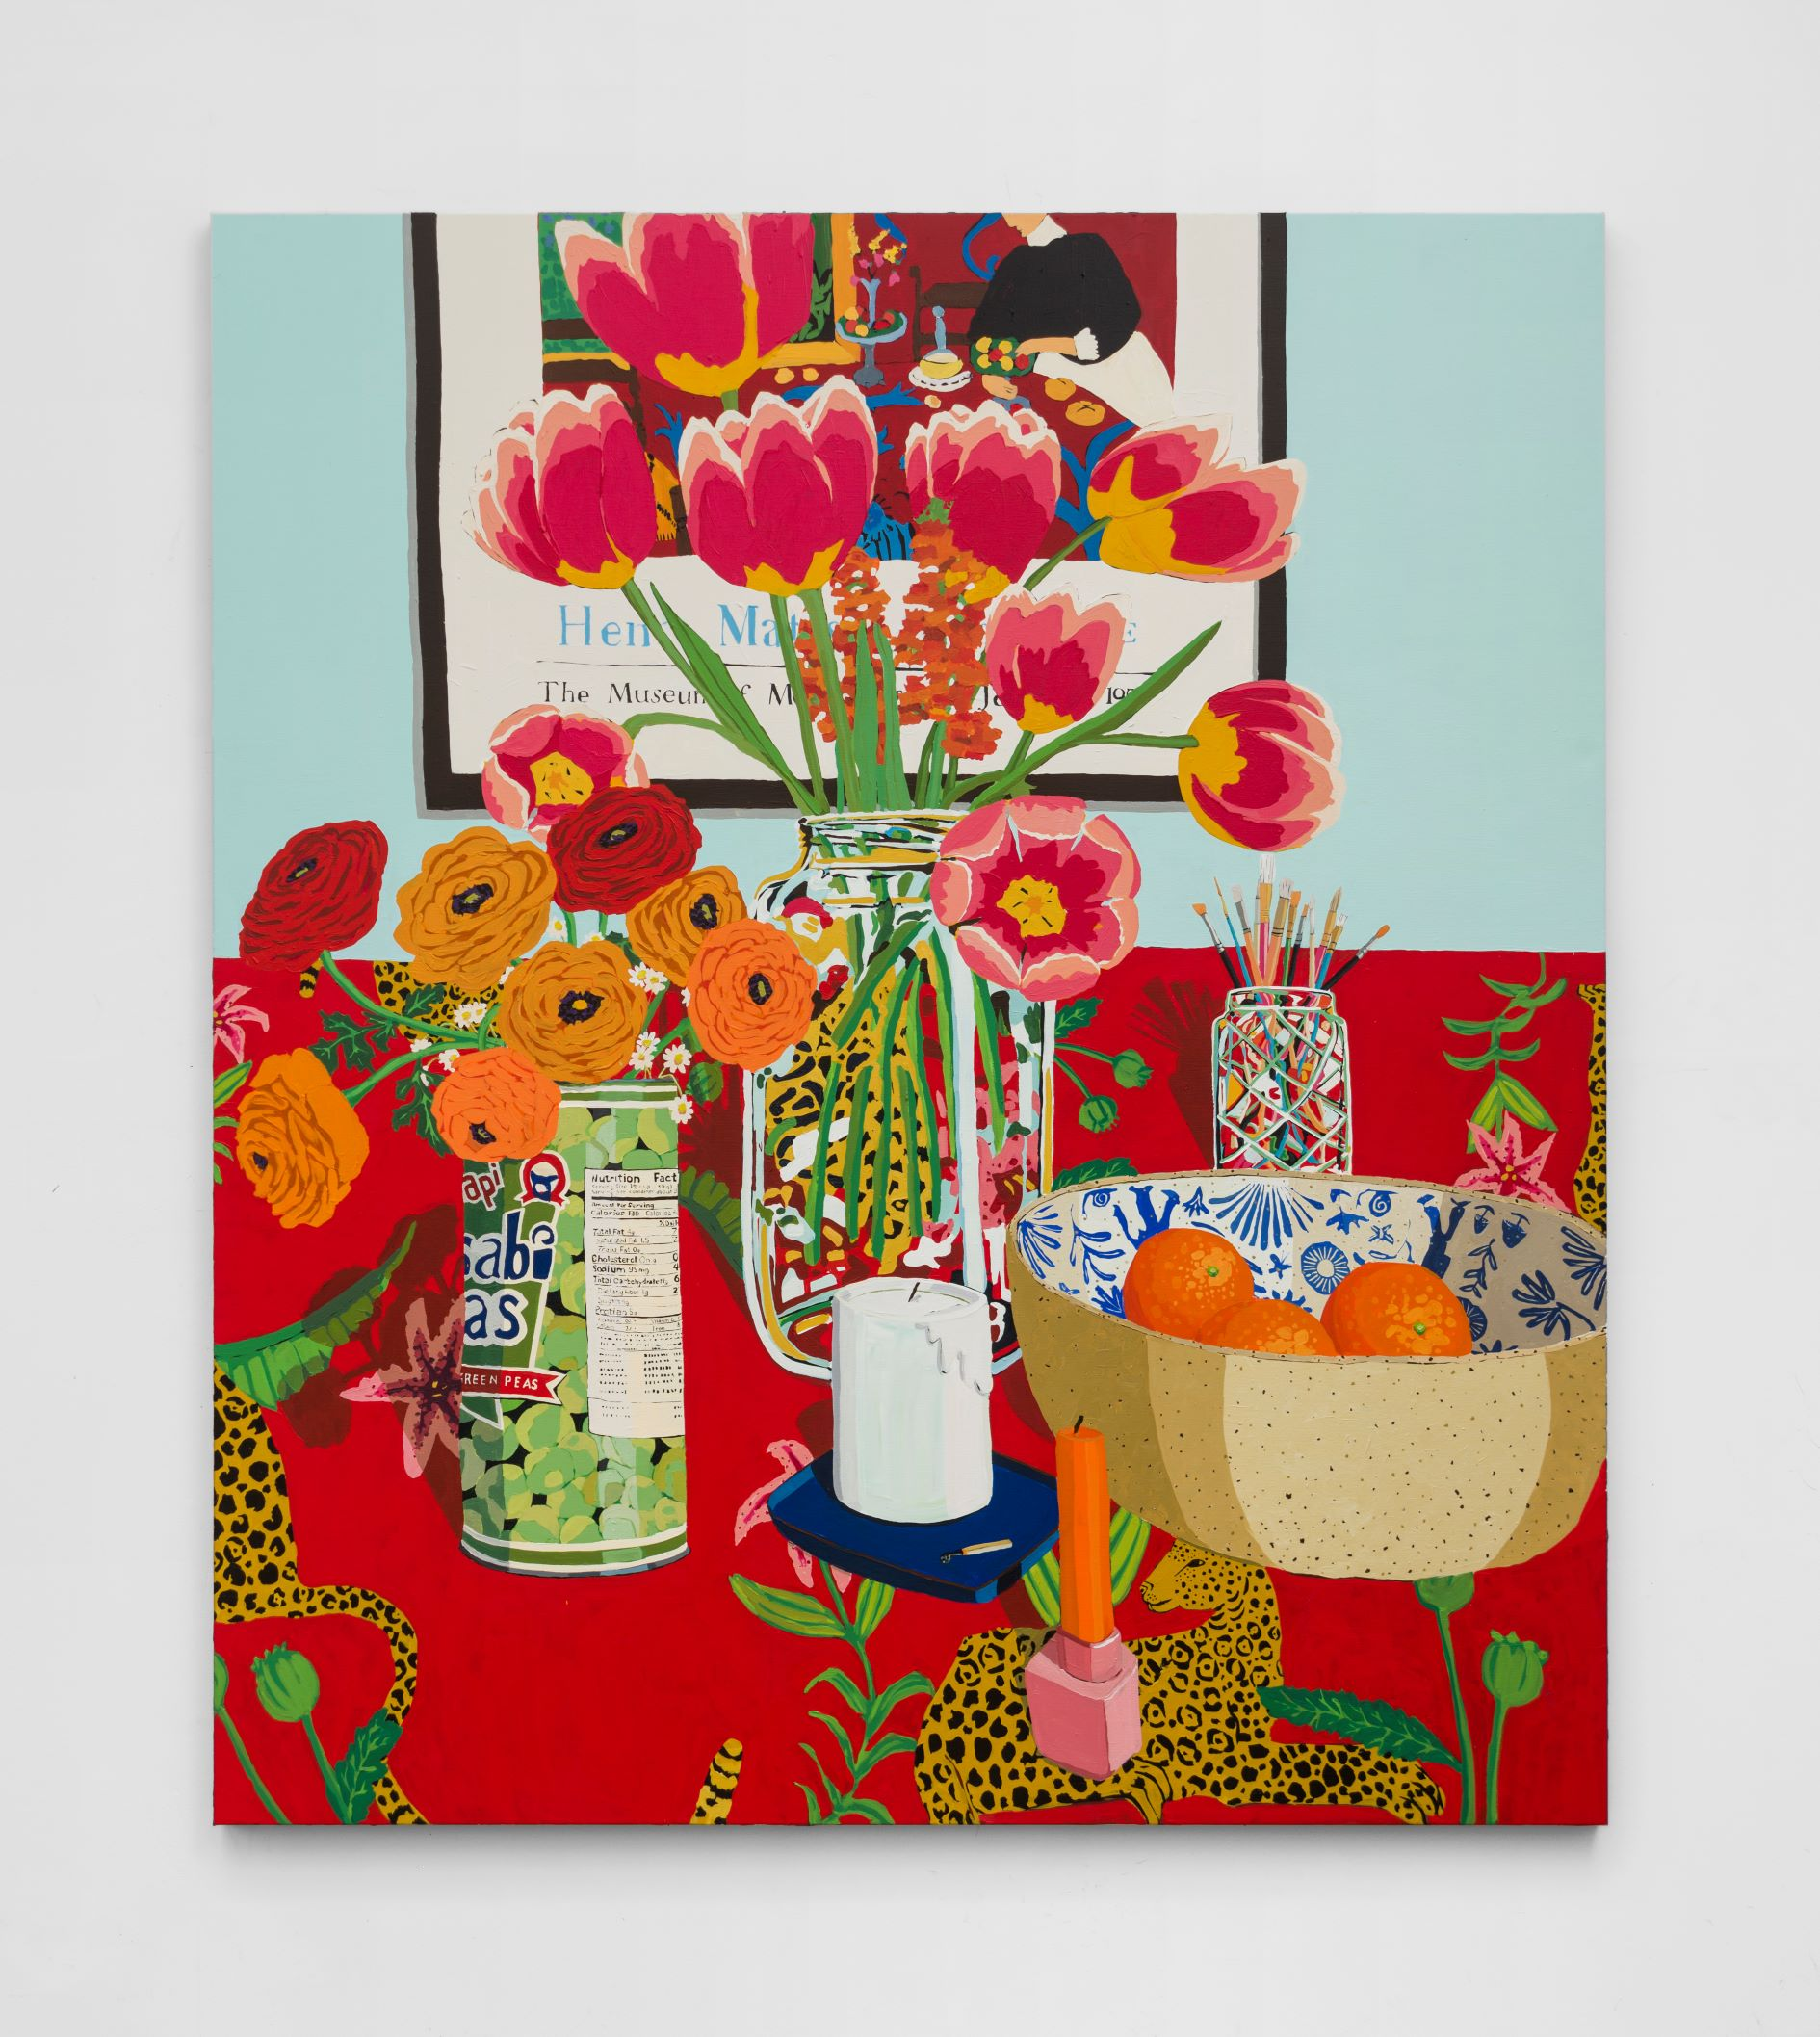 Hilary Pecis, Tulips, Ranunculus, and Oranges, 2021. Acrylic on canvas, © Hilary Pecis, image courtesy of the artist.